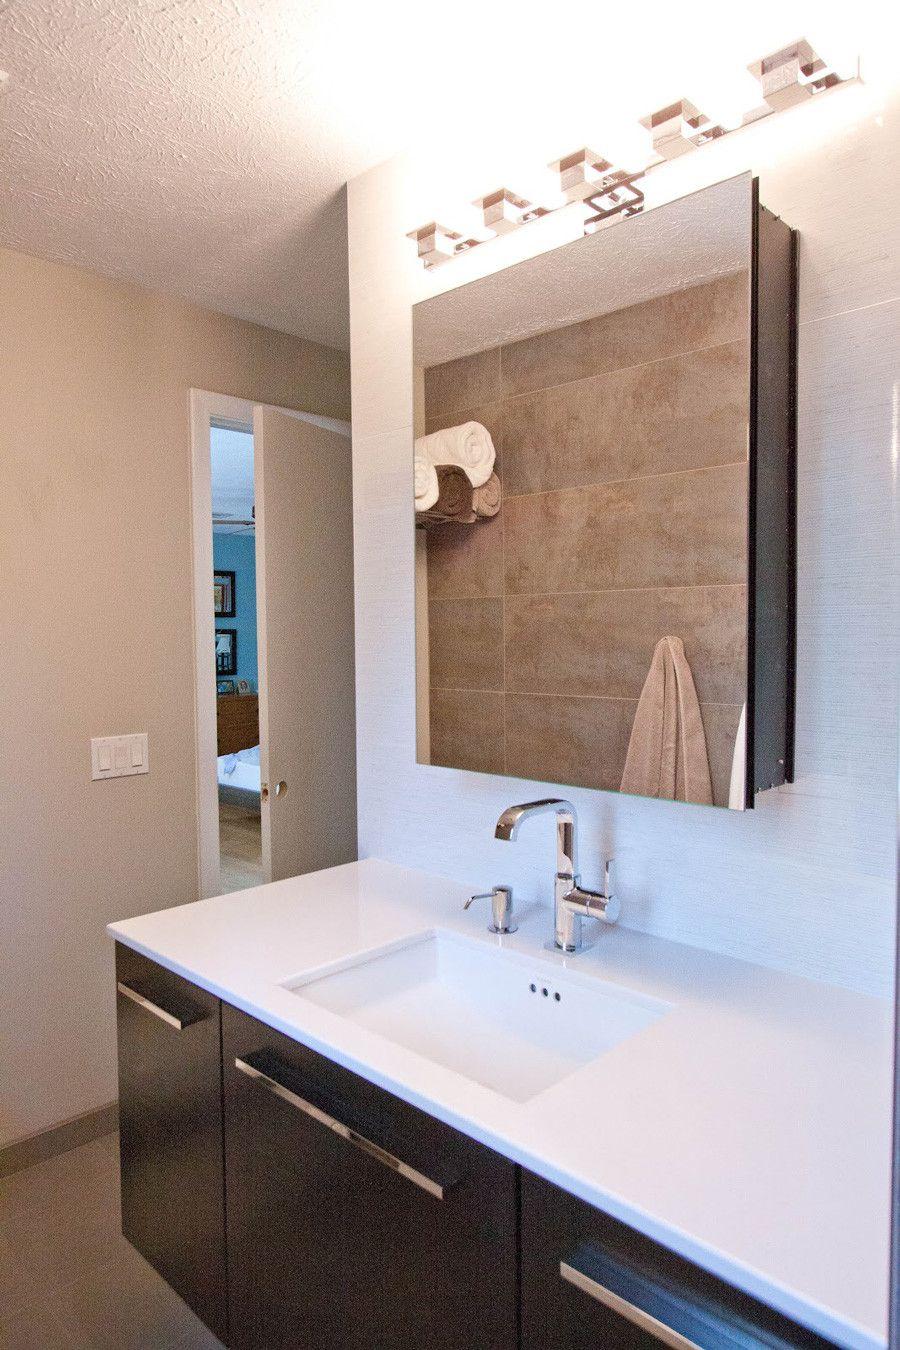 Bathroom Lighting Over Medicine Cabinet